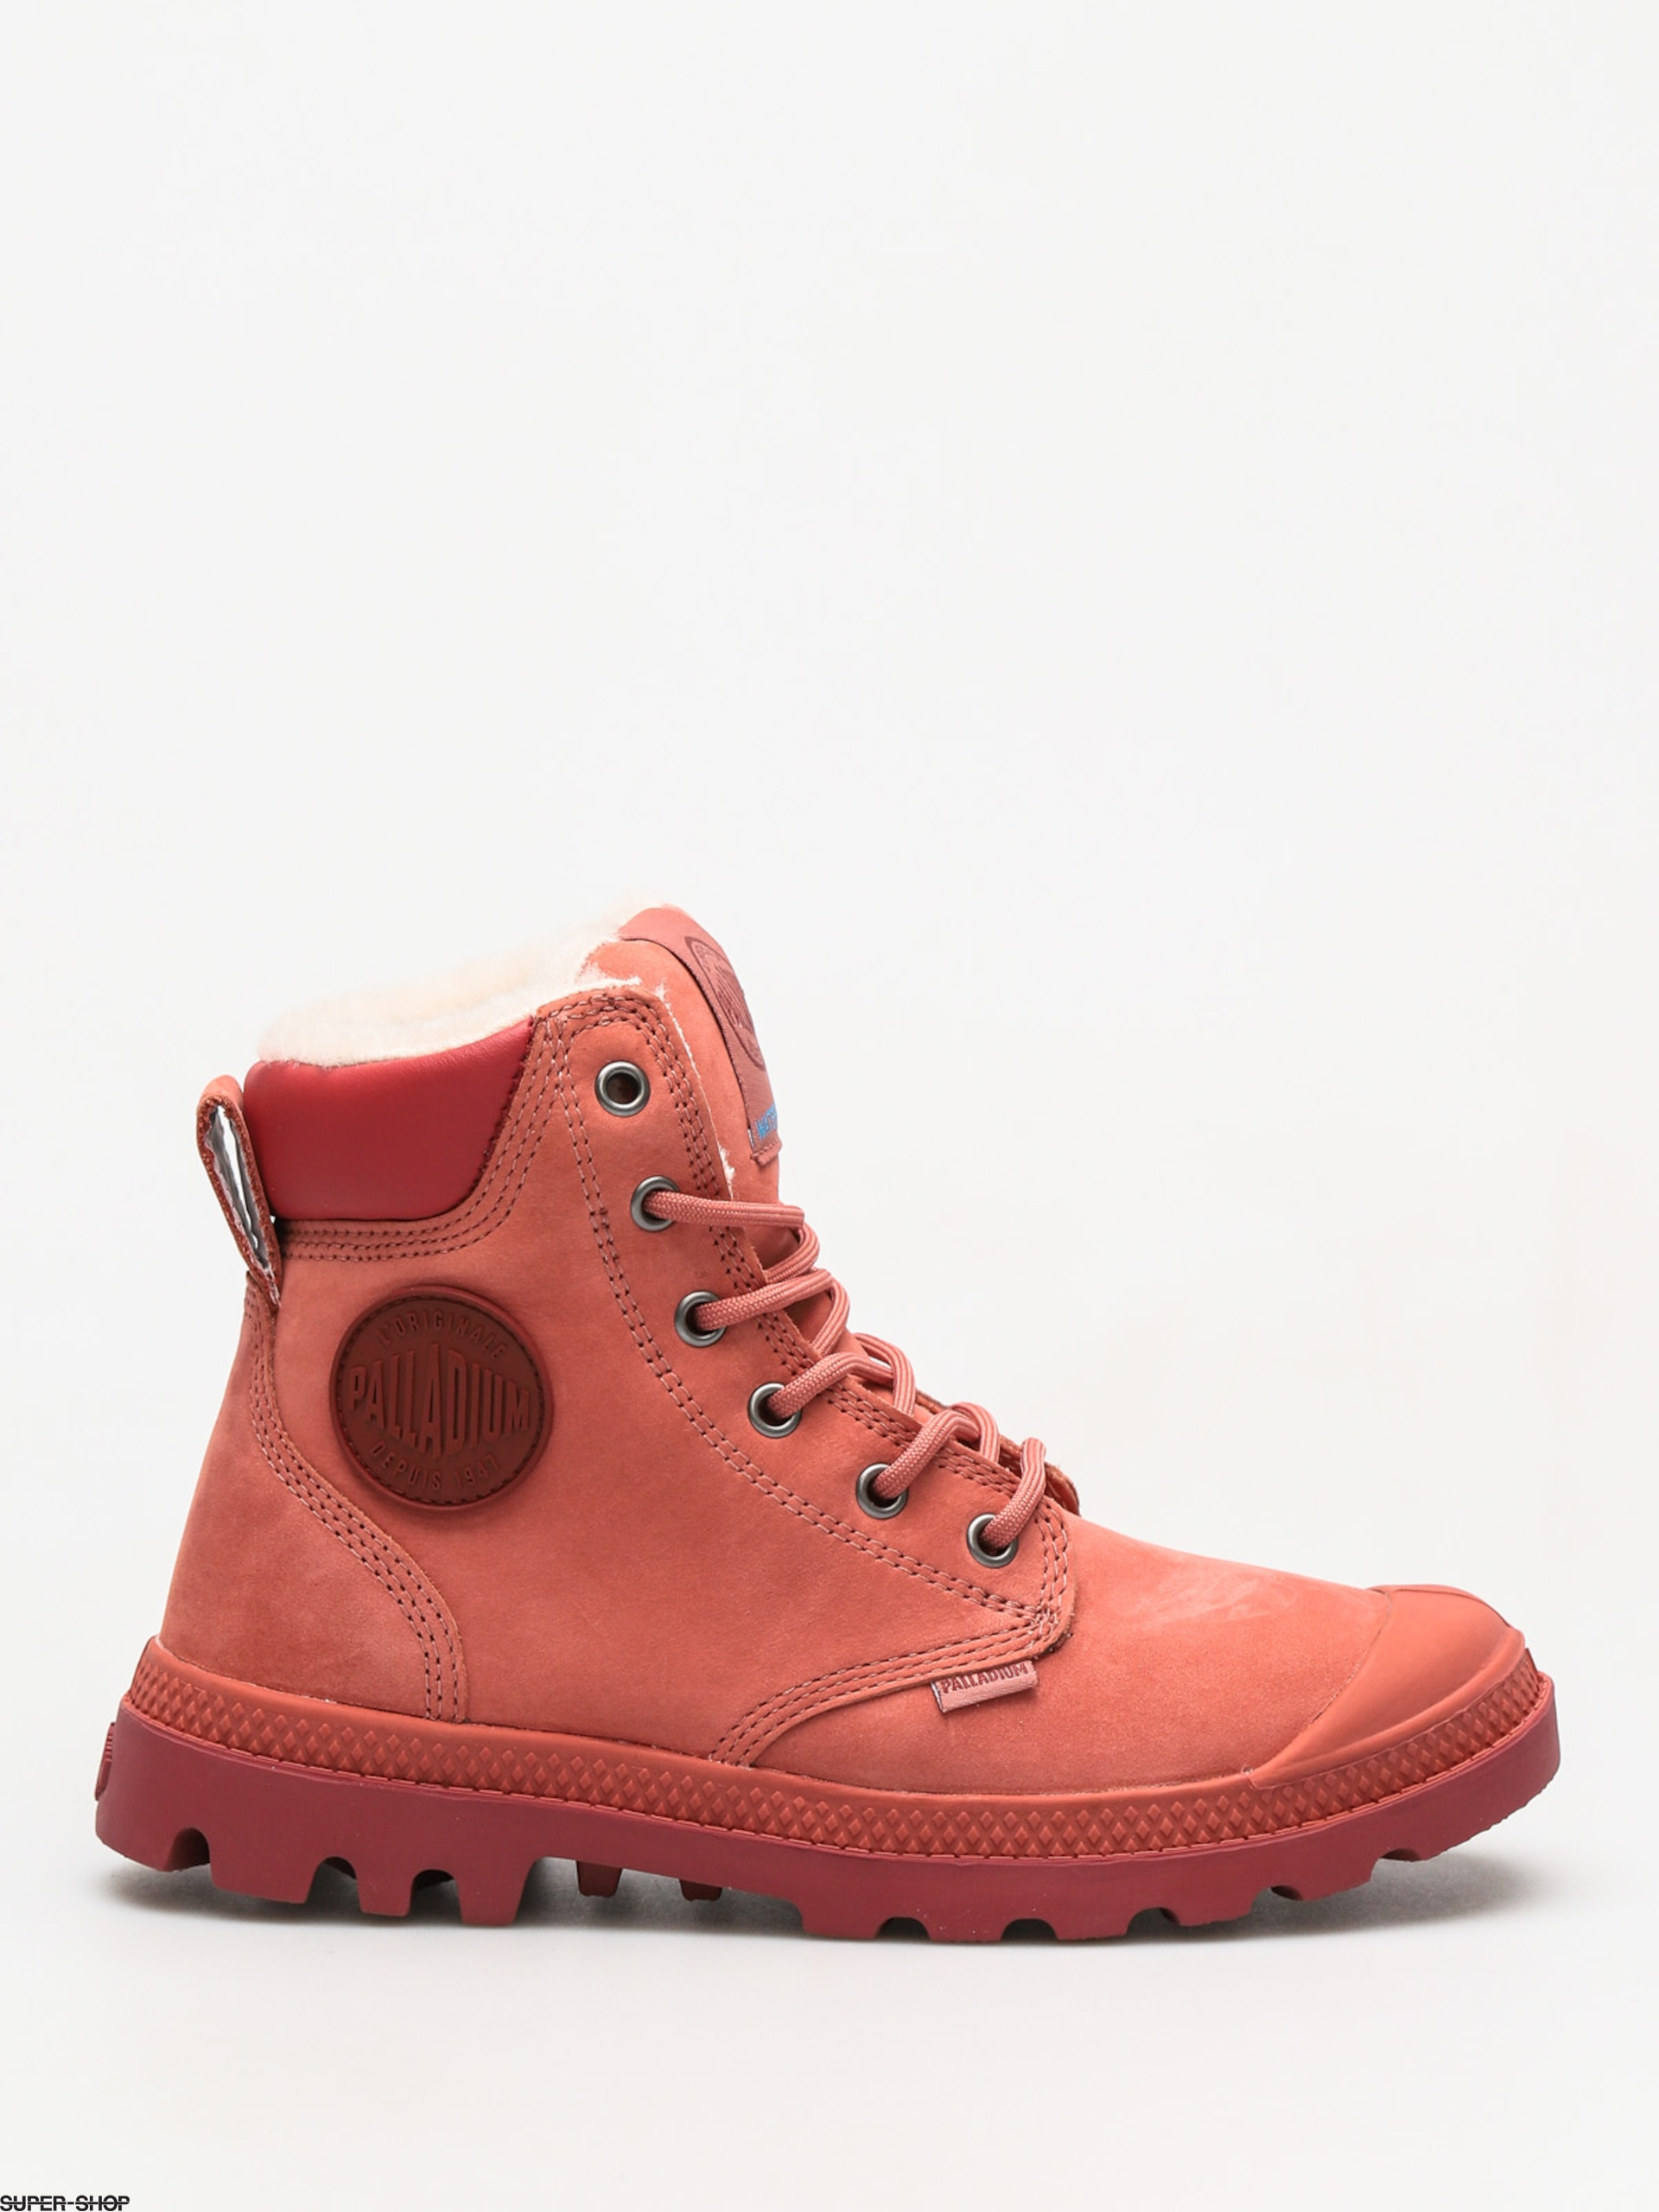 Palladium Shoes Pampa Sport Wps (brick dust cowhide) f434c1eb6bc